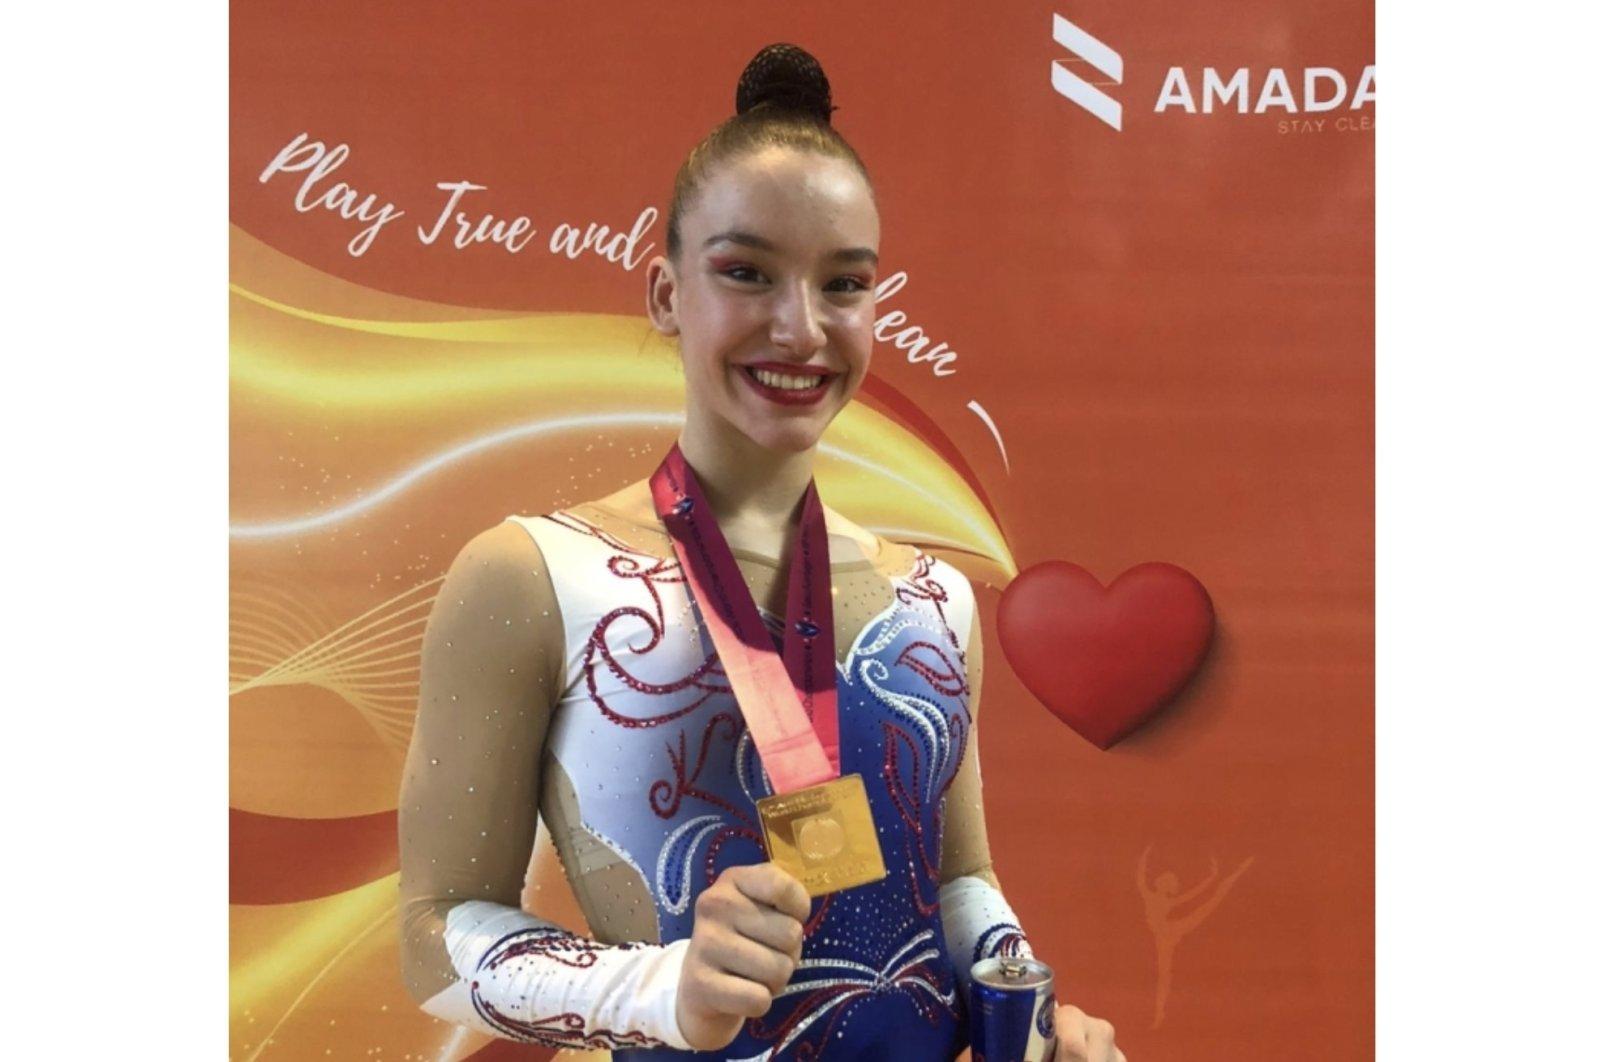 Turkish gymnast Ayşe Begüm Onbaşı posing with her gold medal won at the 16th FIG Aerobic Gymnastics World Championships in Baku, Azerbaijan, May 28, 2021. (Photo by RedBull via AA)